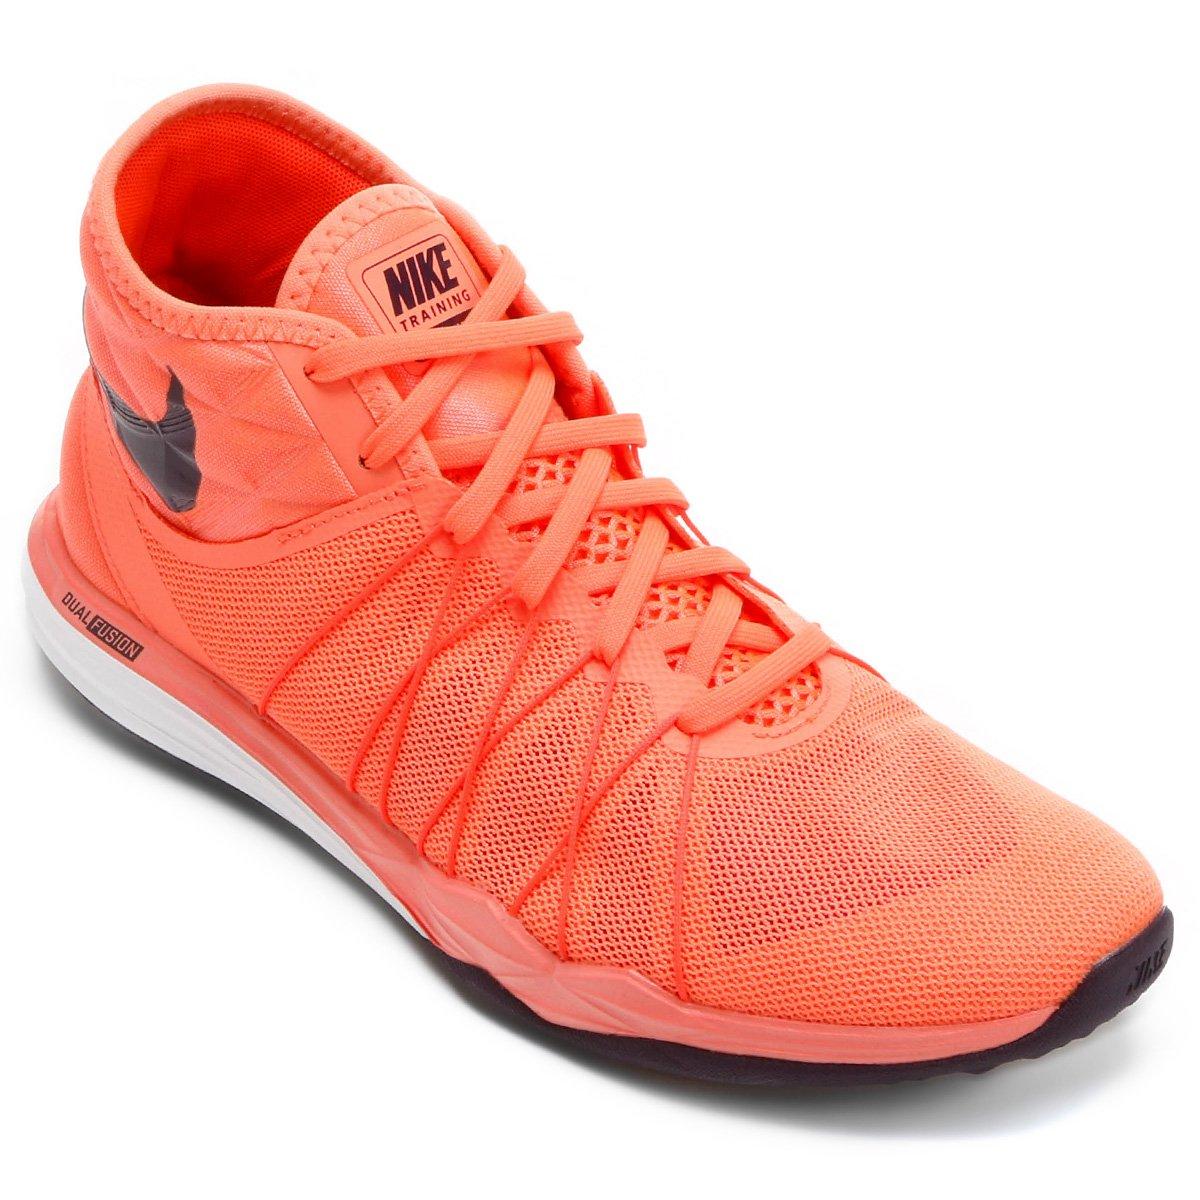 21eaa55bca3 Tênis Nike Dual Fusion TR Hit Feminino - Laranja e Preto - Compre Agora